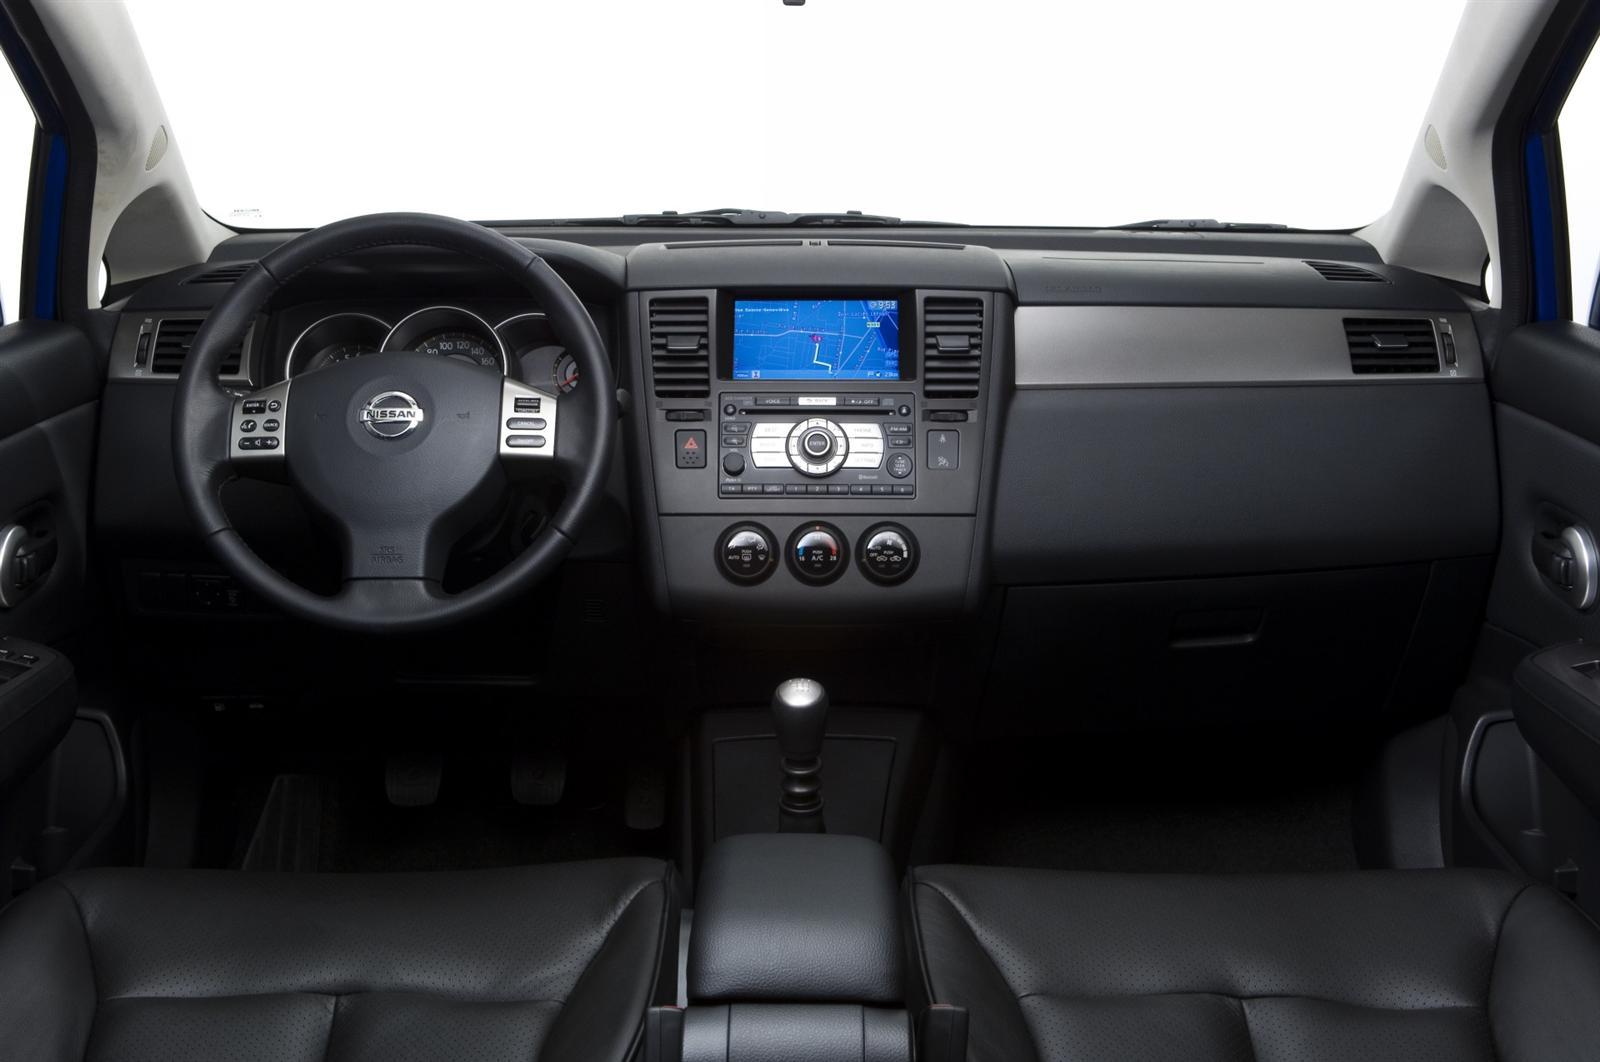 2008 Nissan Tiida Image. Photo 3 of 35